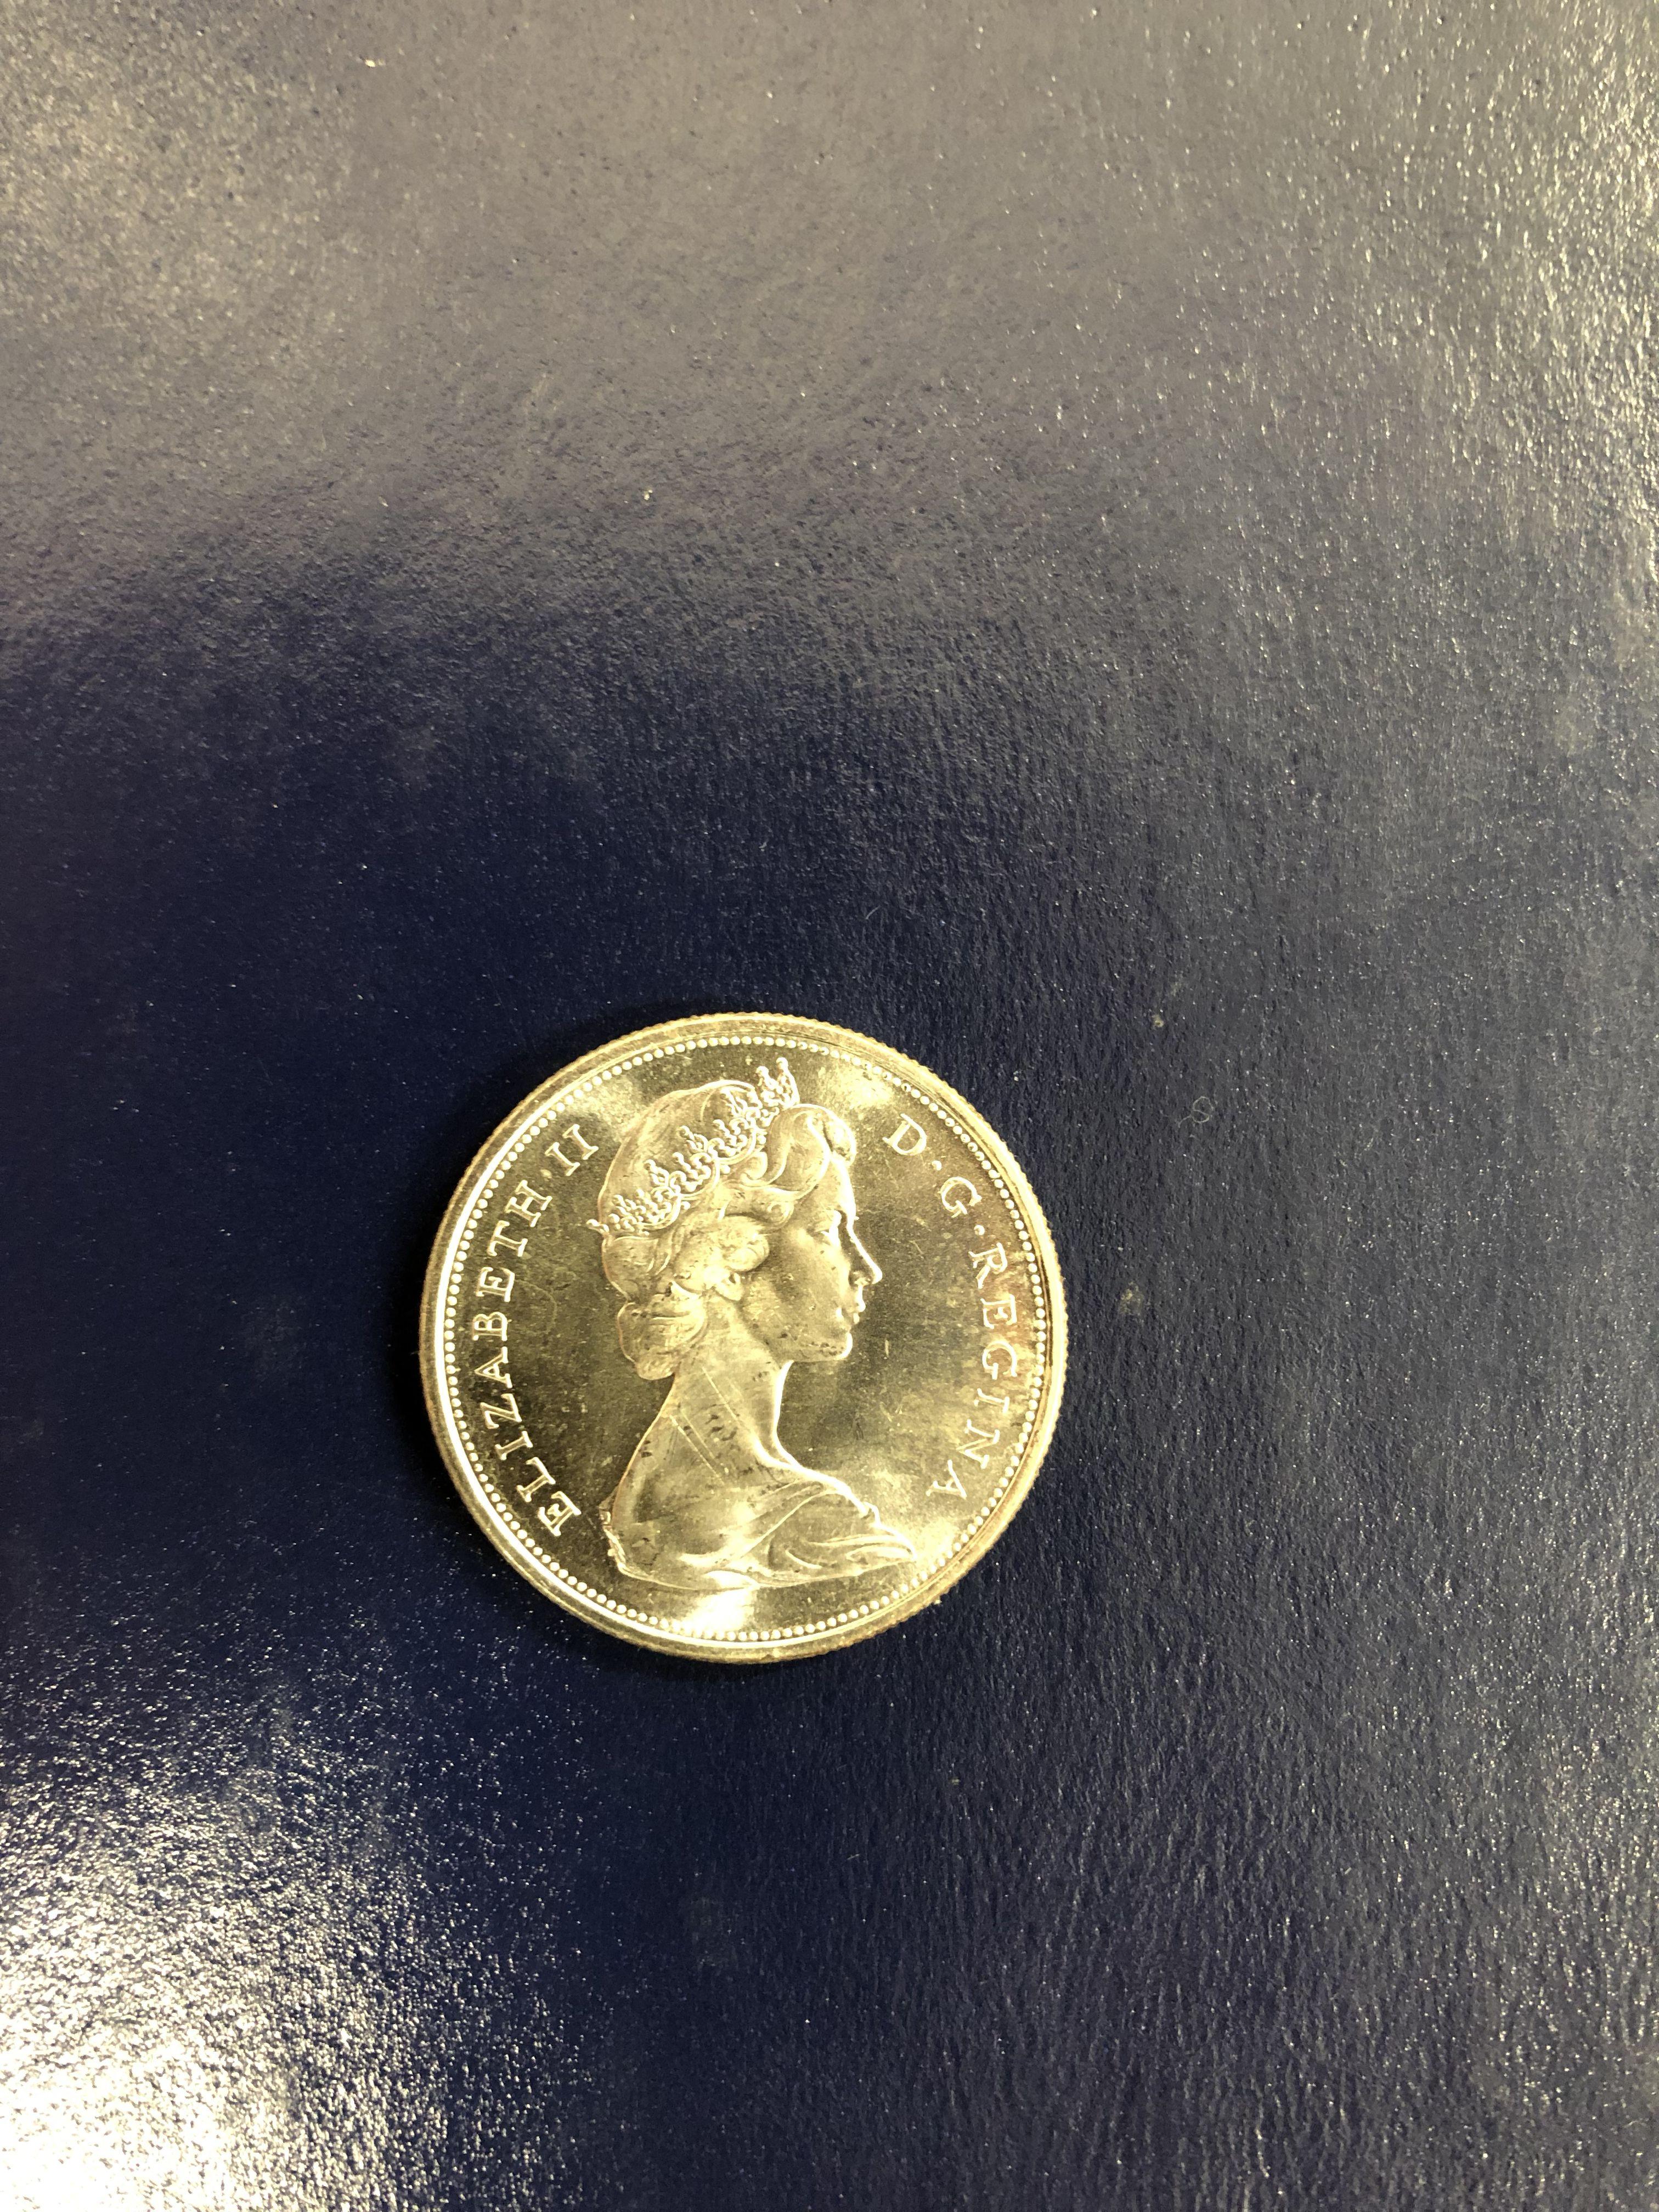 Rare canadian centennial half rare coinage vintage